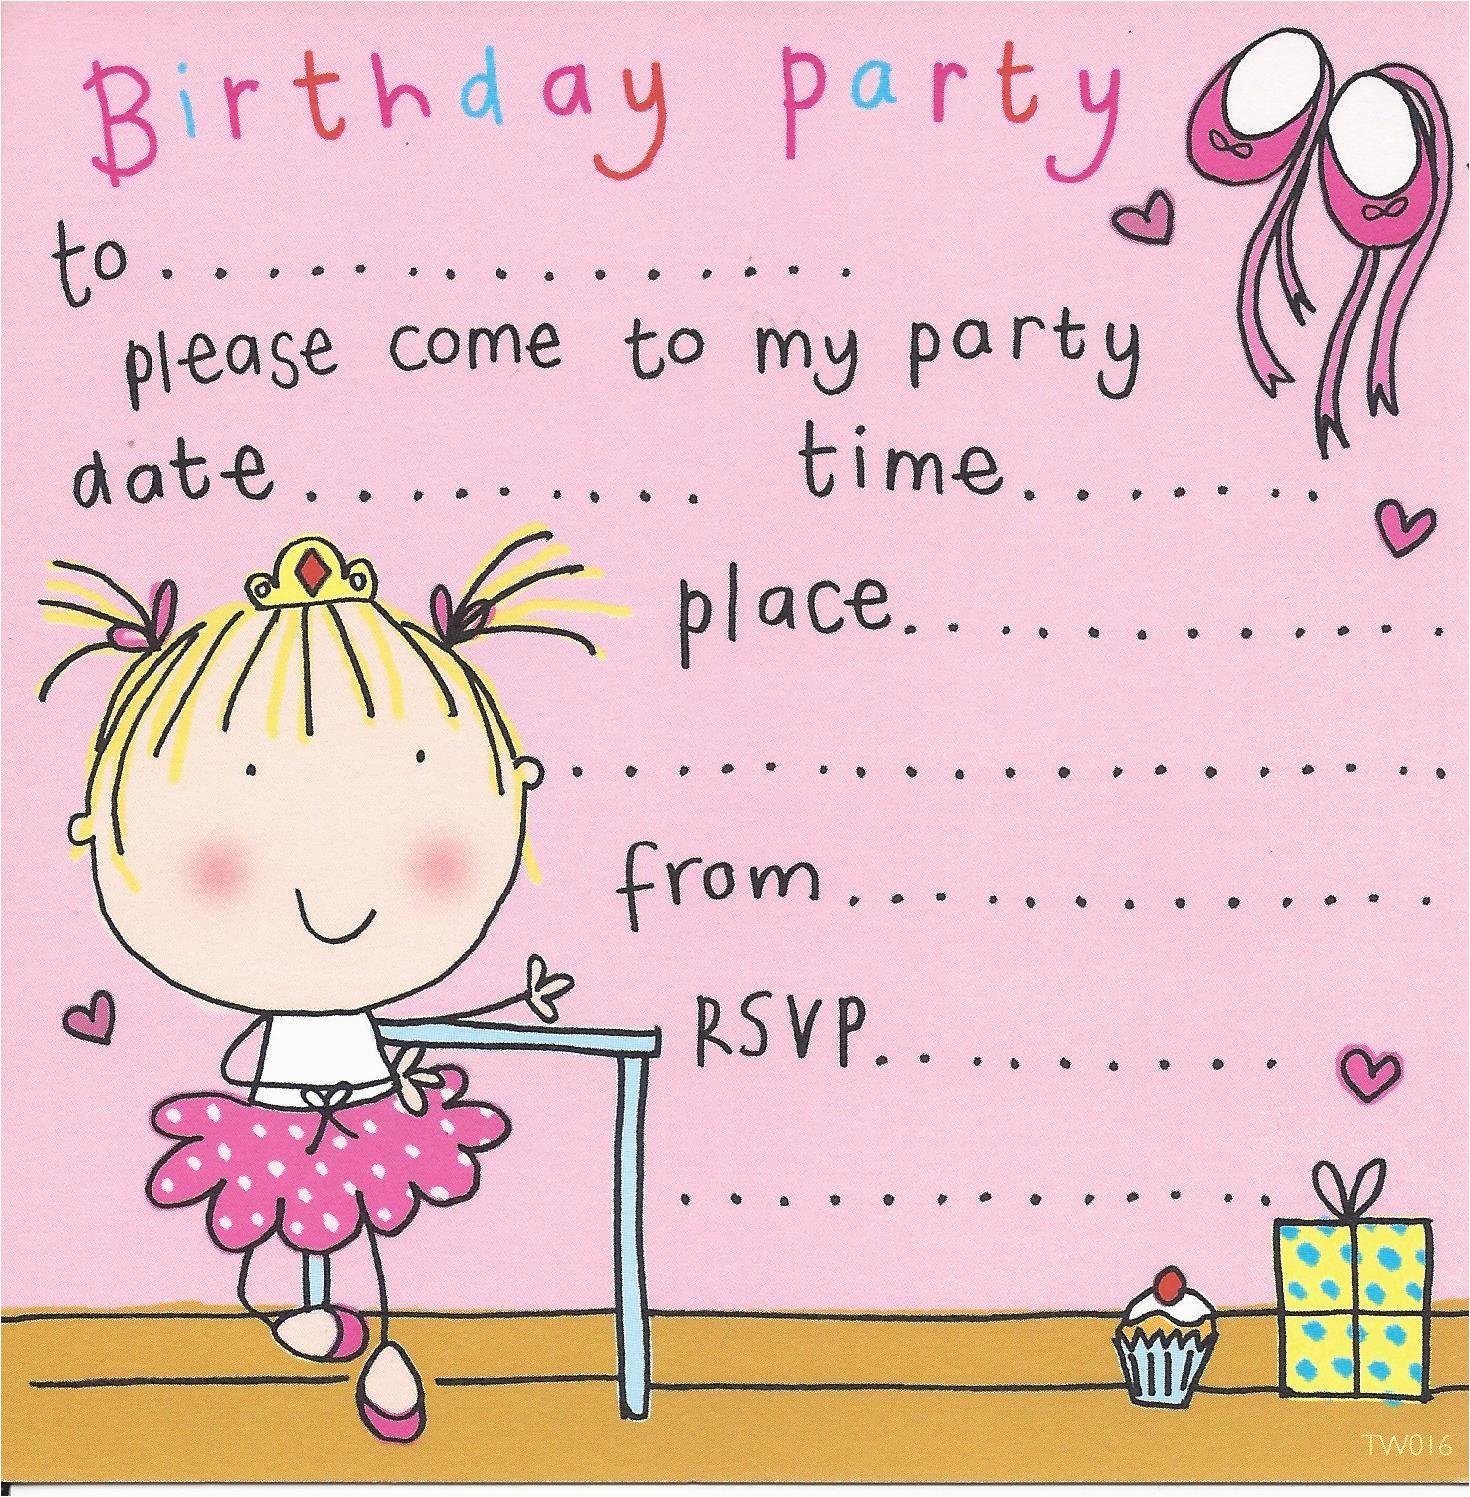 kids party invitationshappy party idea